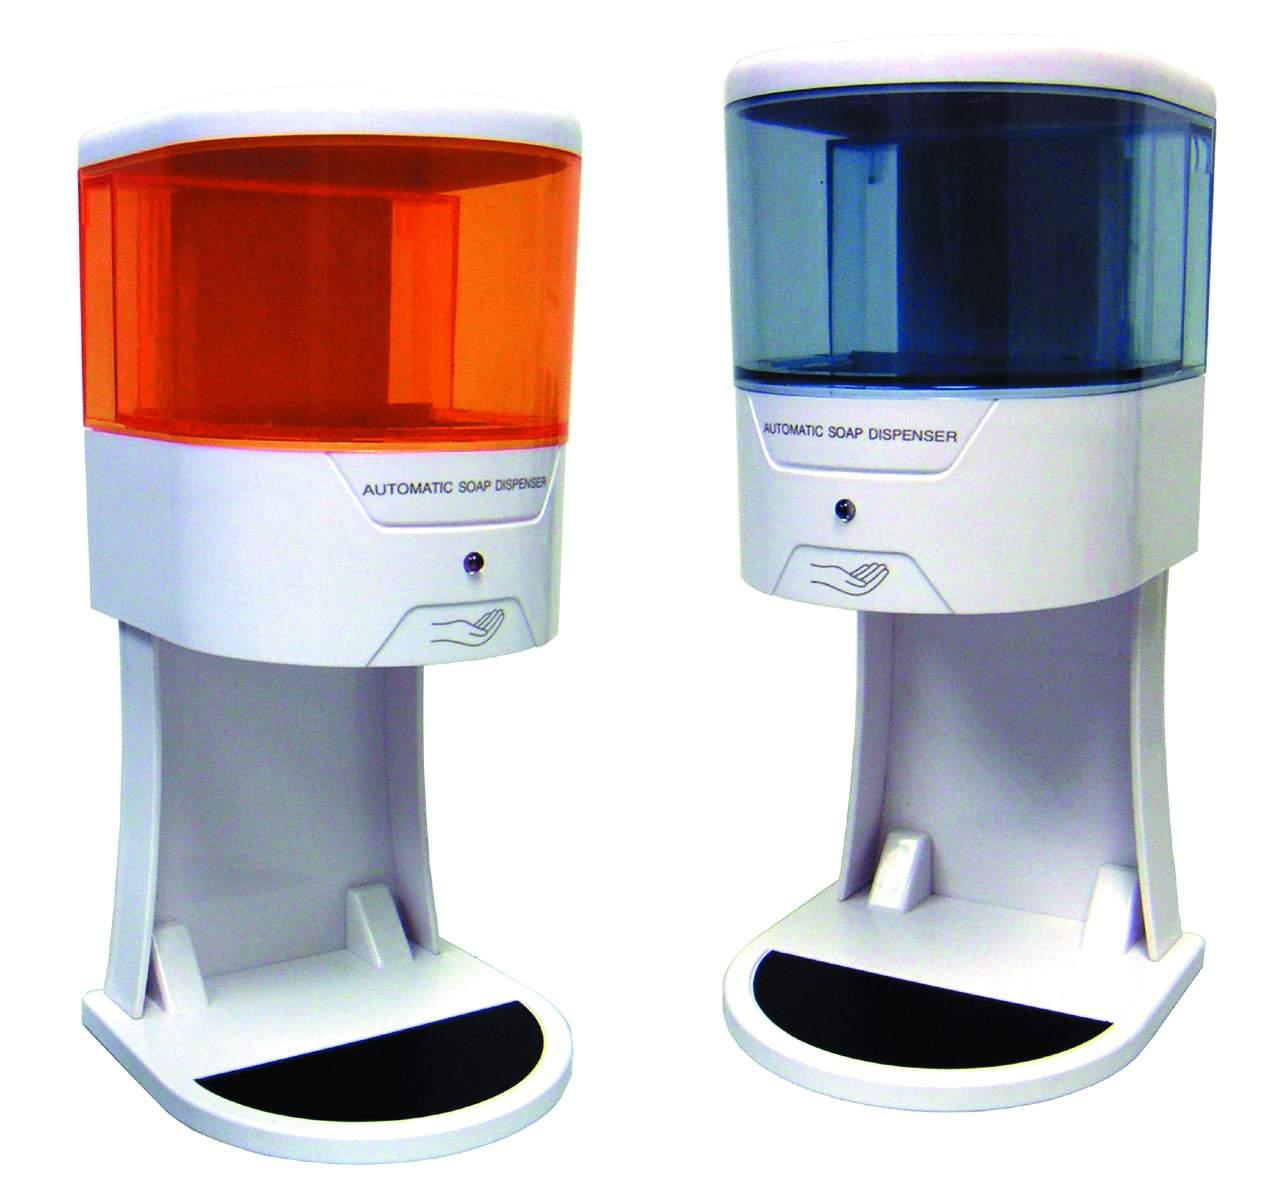 Automatic Kong Dispenser ~ Golden spring enterprises ltd